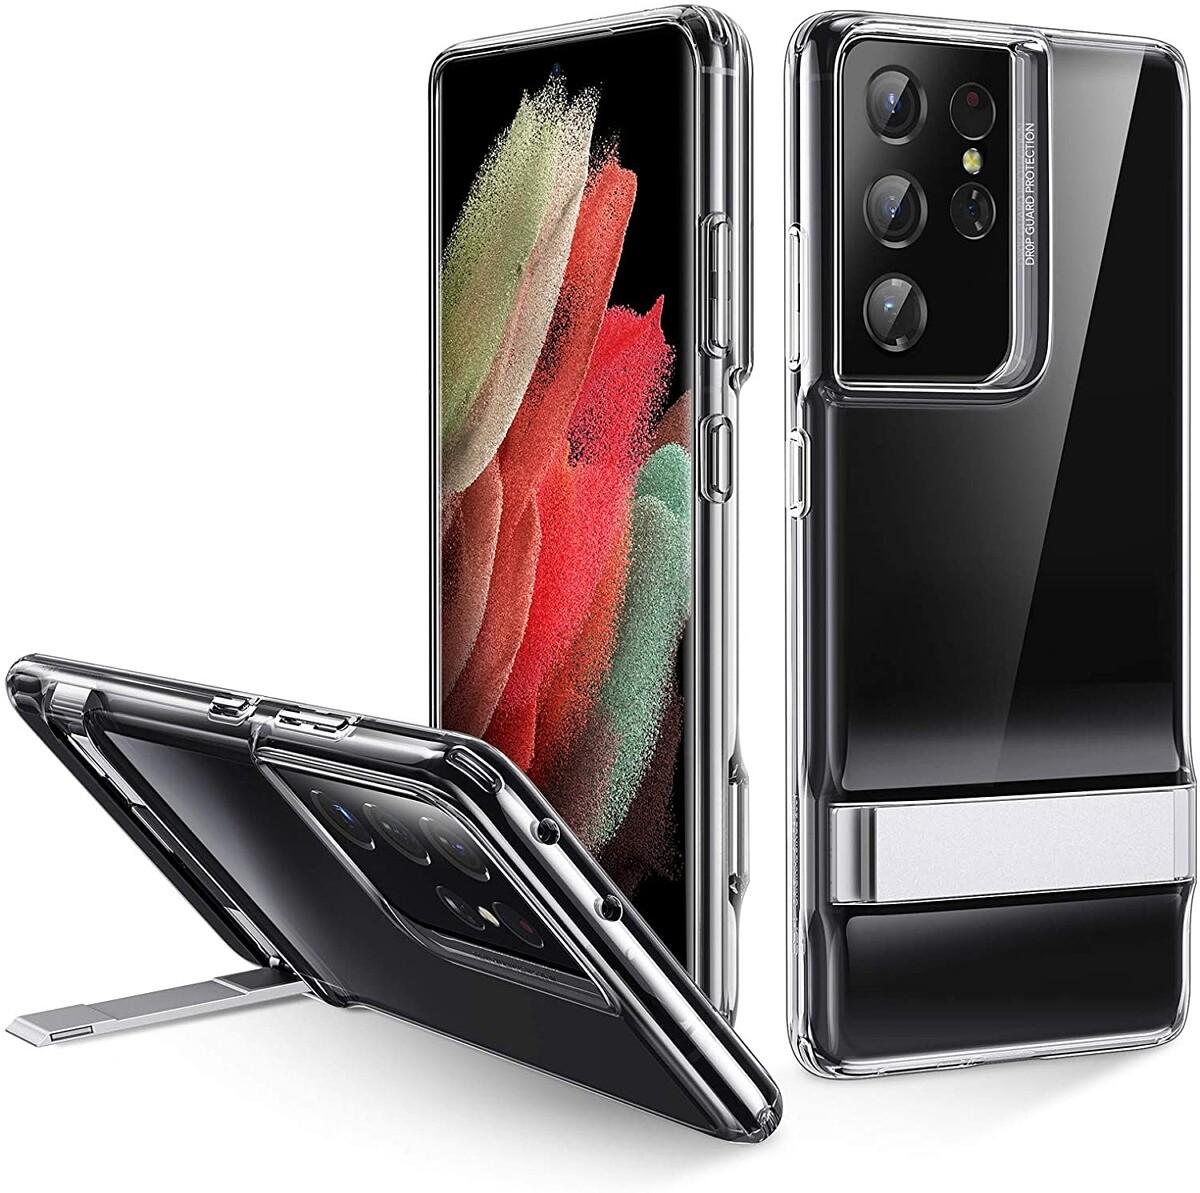 ESR Metal Kickstand Case for Galaxy S21 Ultra